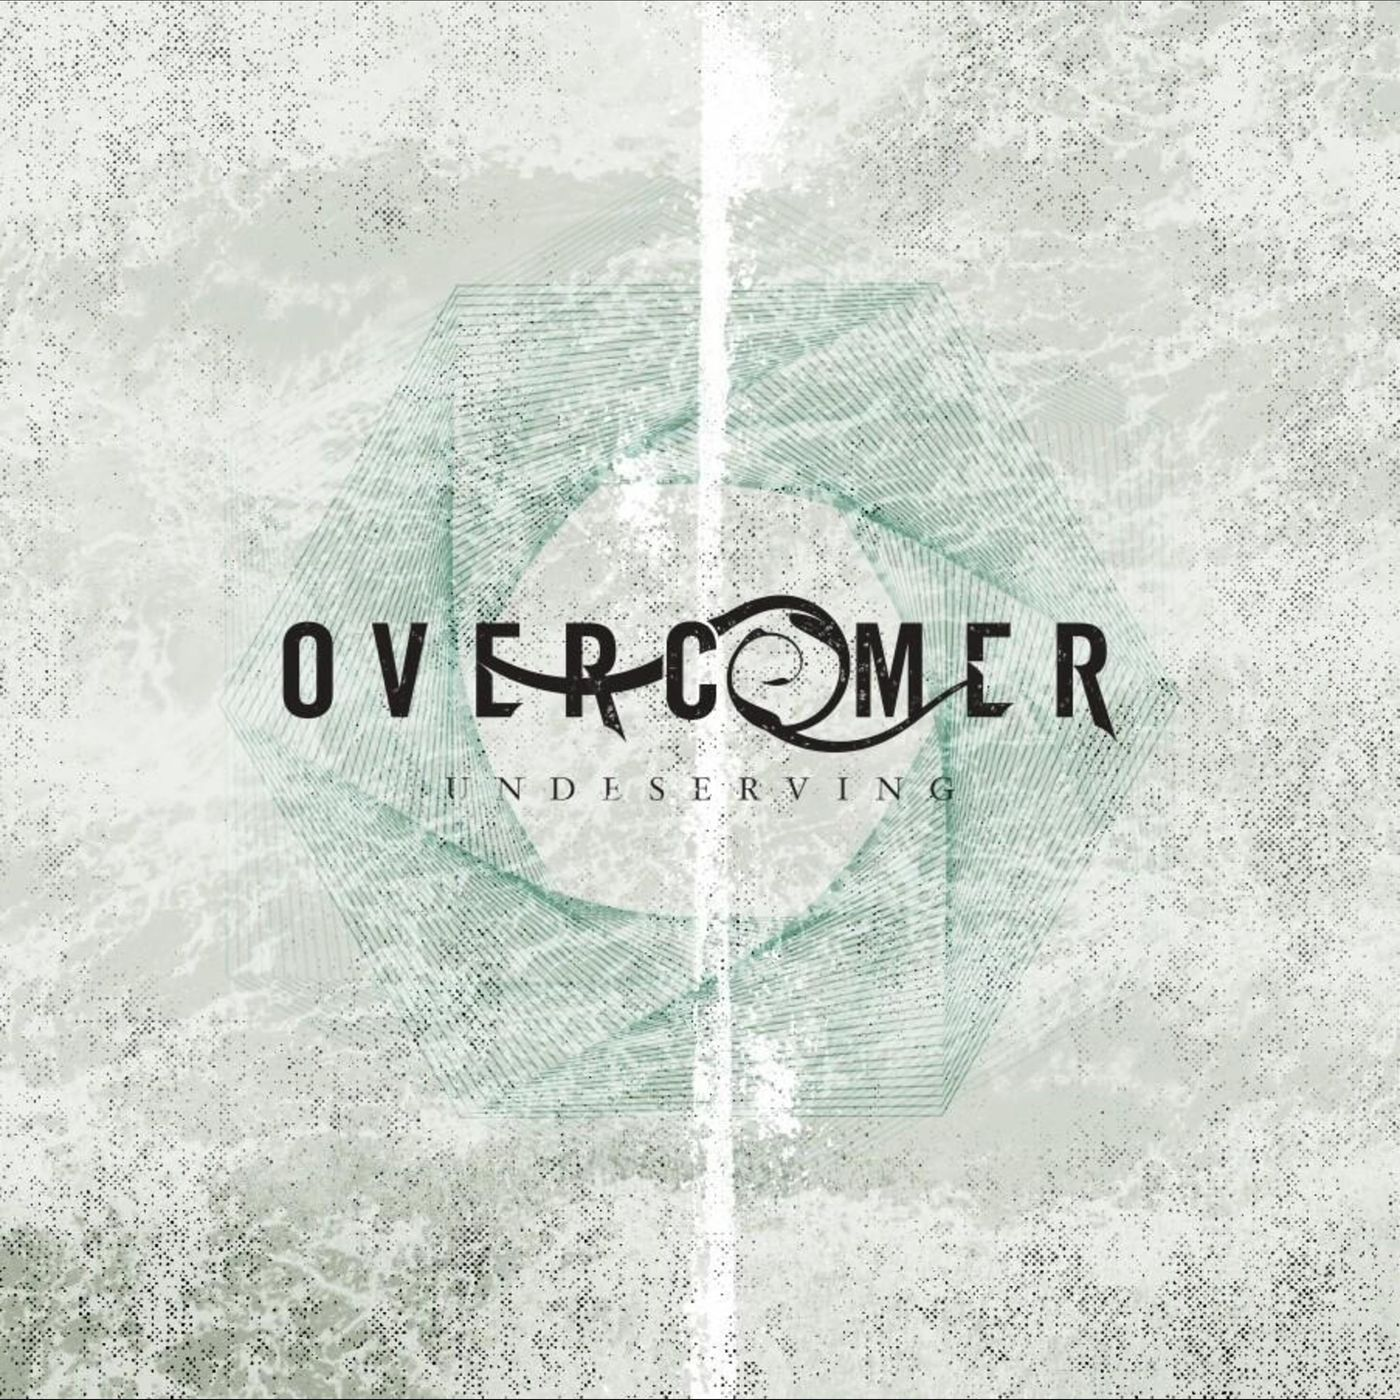 Overcomer - Undeserving [EP] (2017)